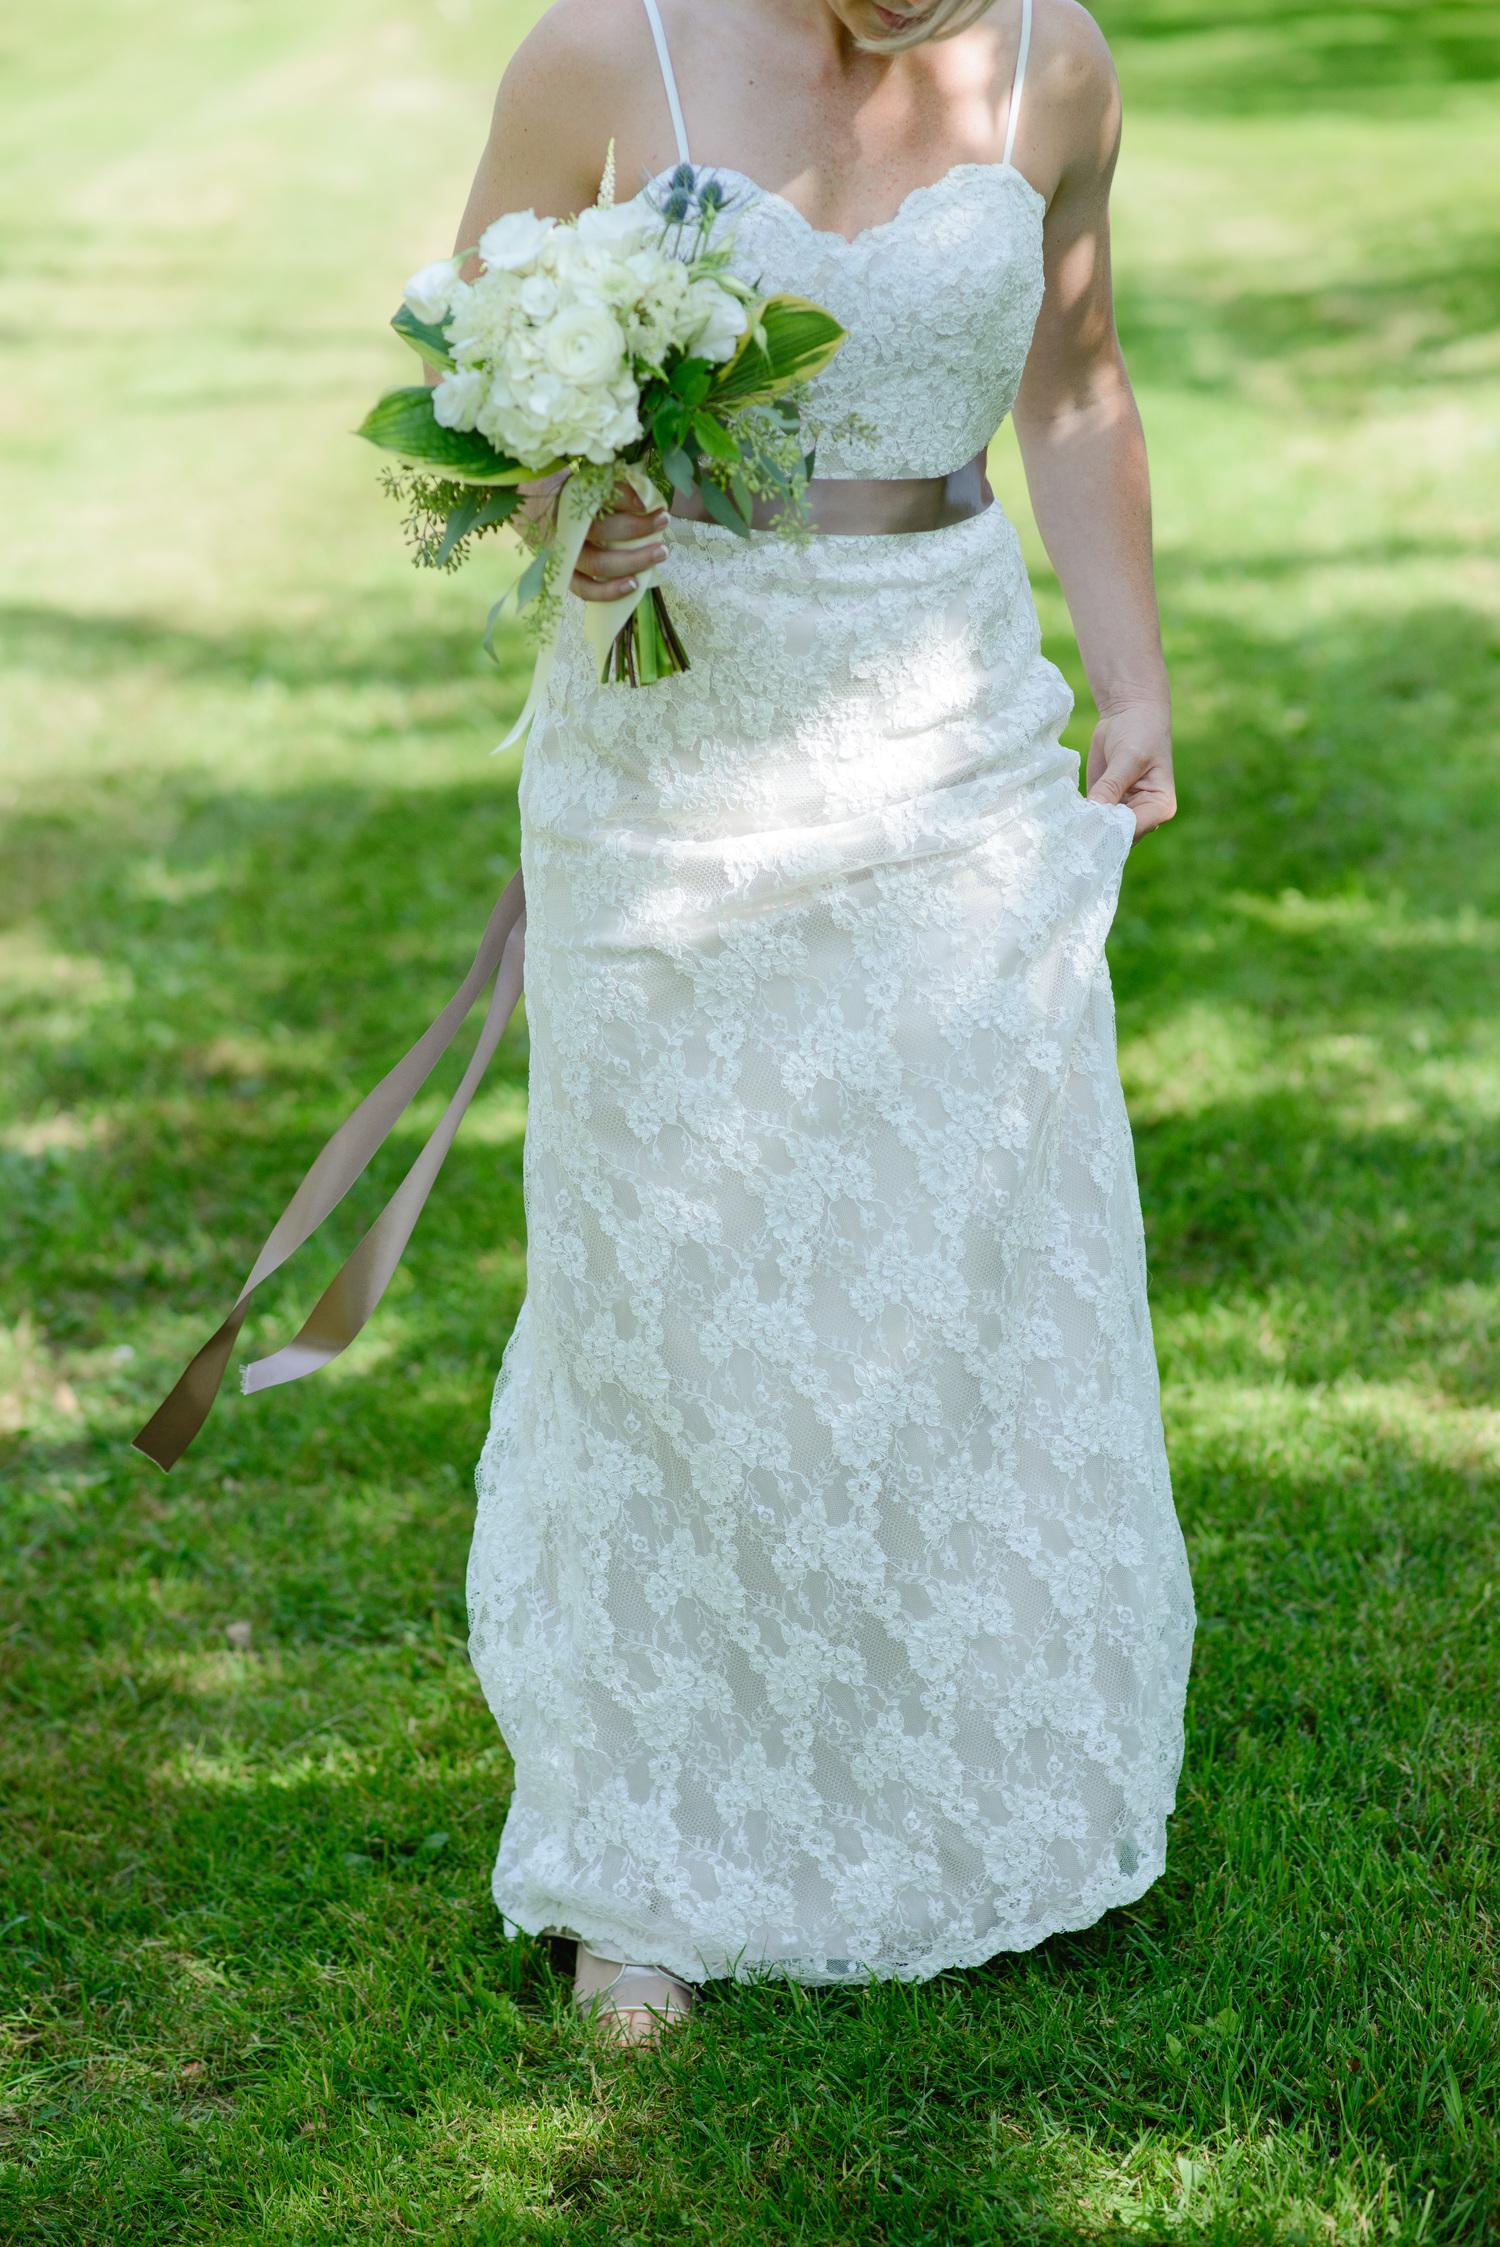 clarks-cove-farm-wedding-walpole-maine-015.jpg